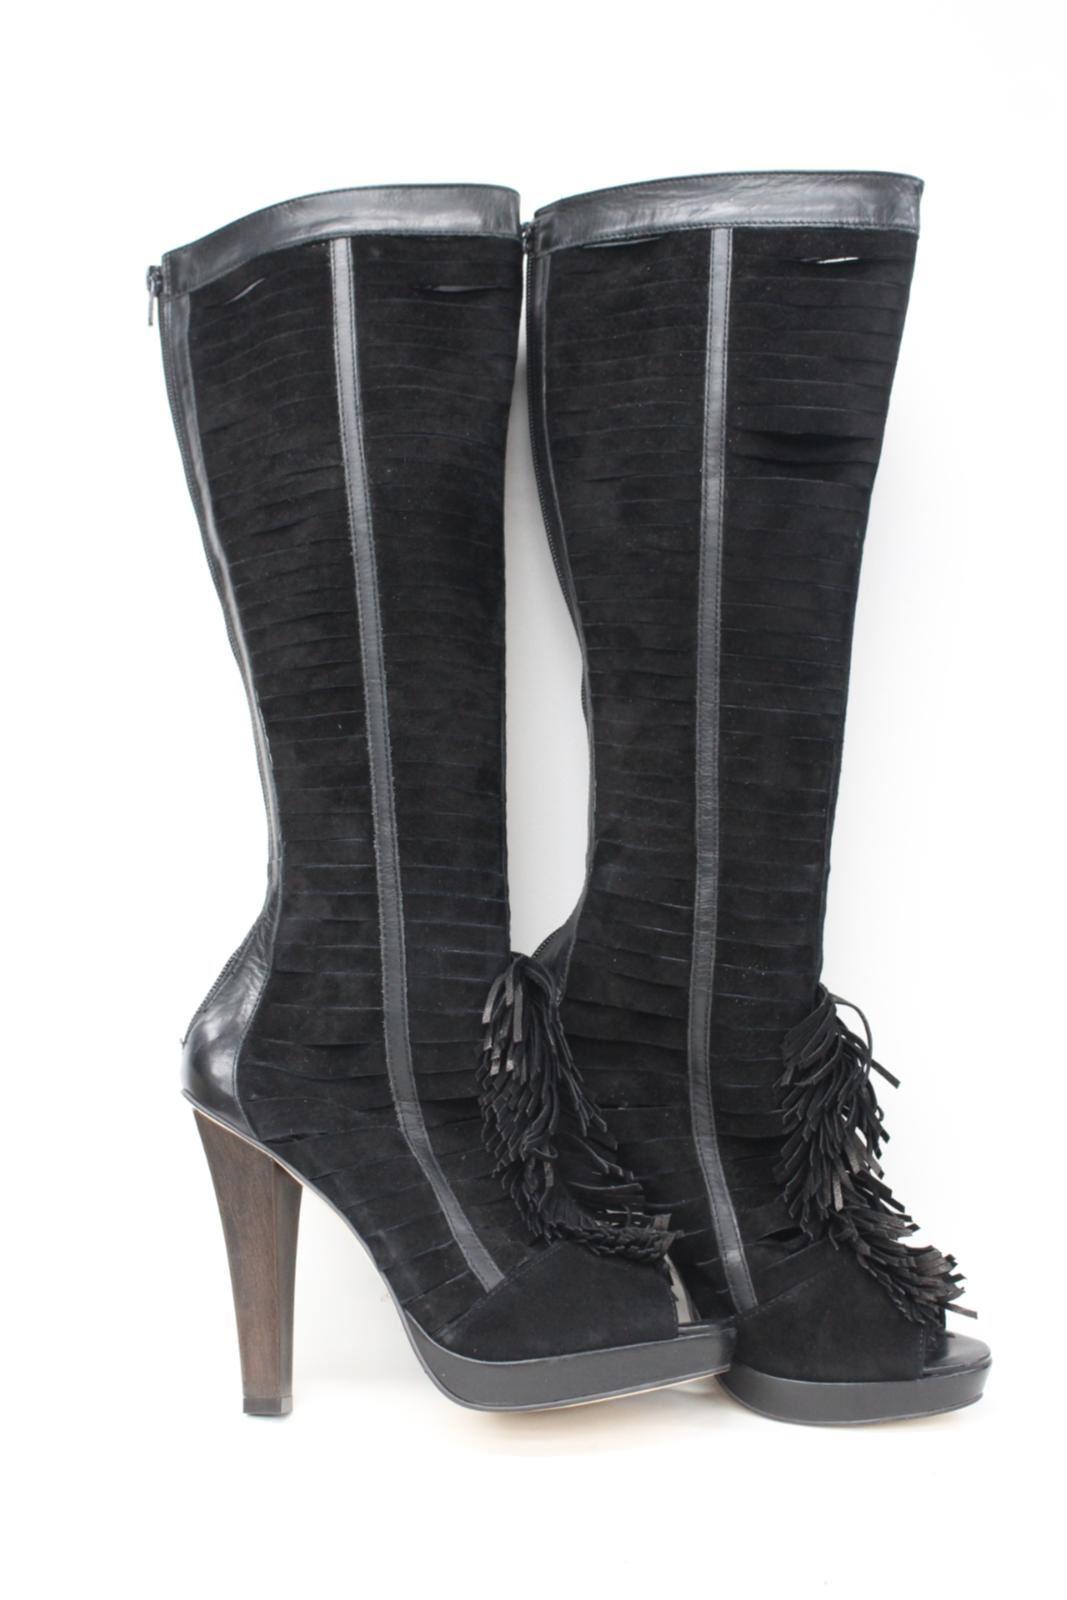 CARVELA Ladies Black Suede High Heel Zip Up Peep Toe Knee High Boots UK7 EU40